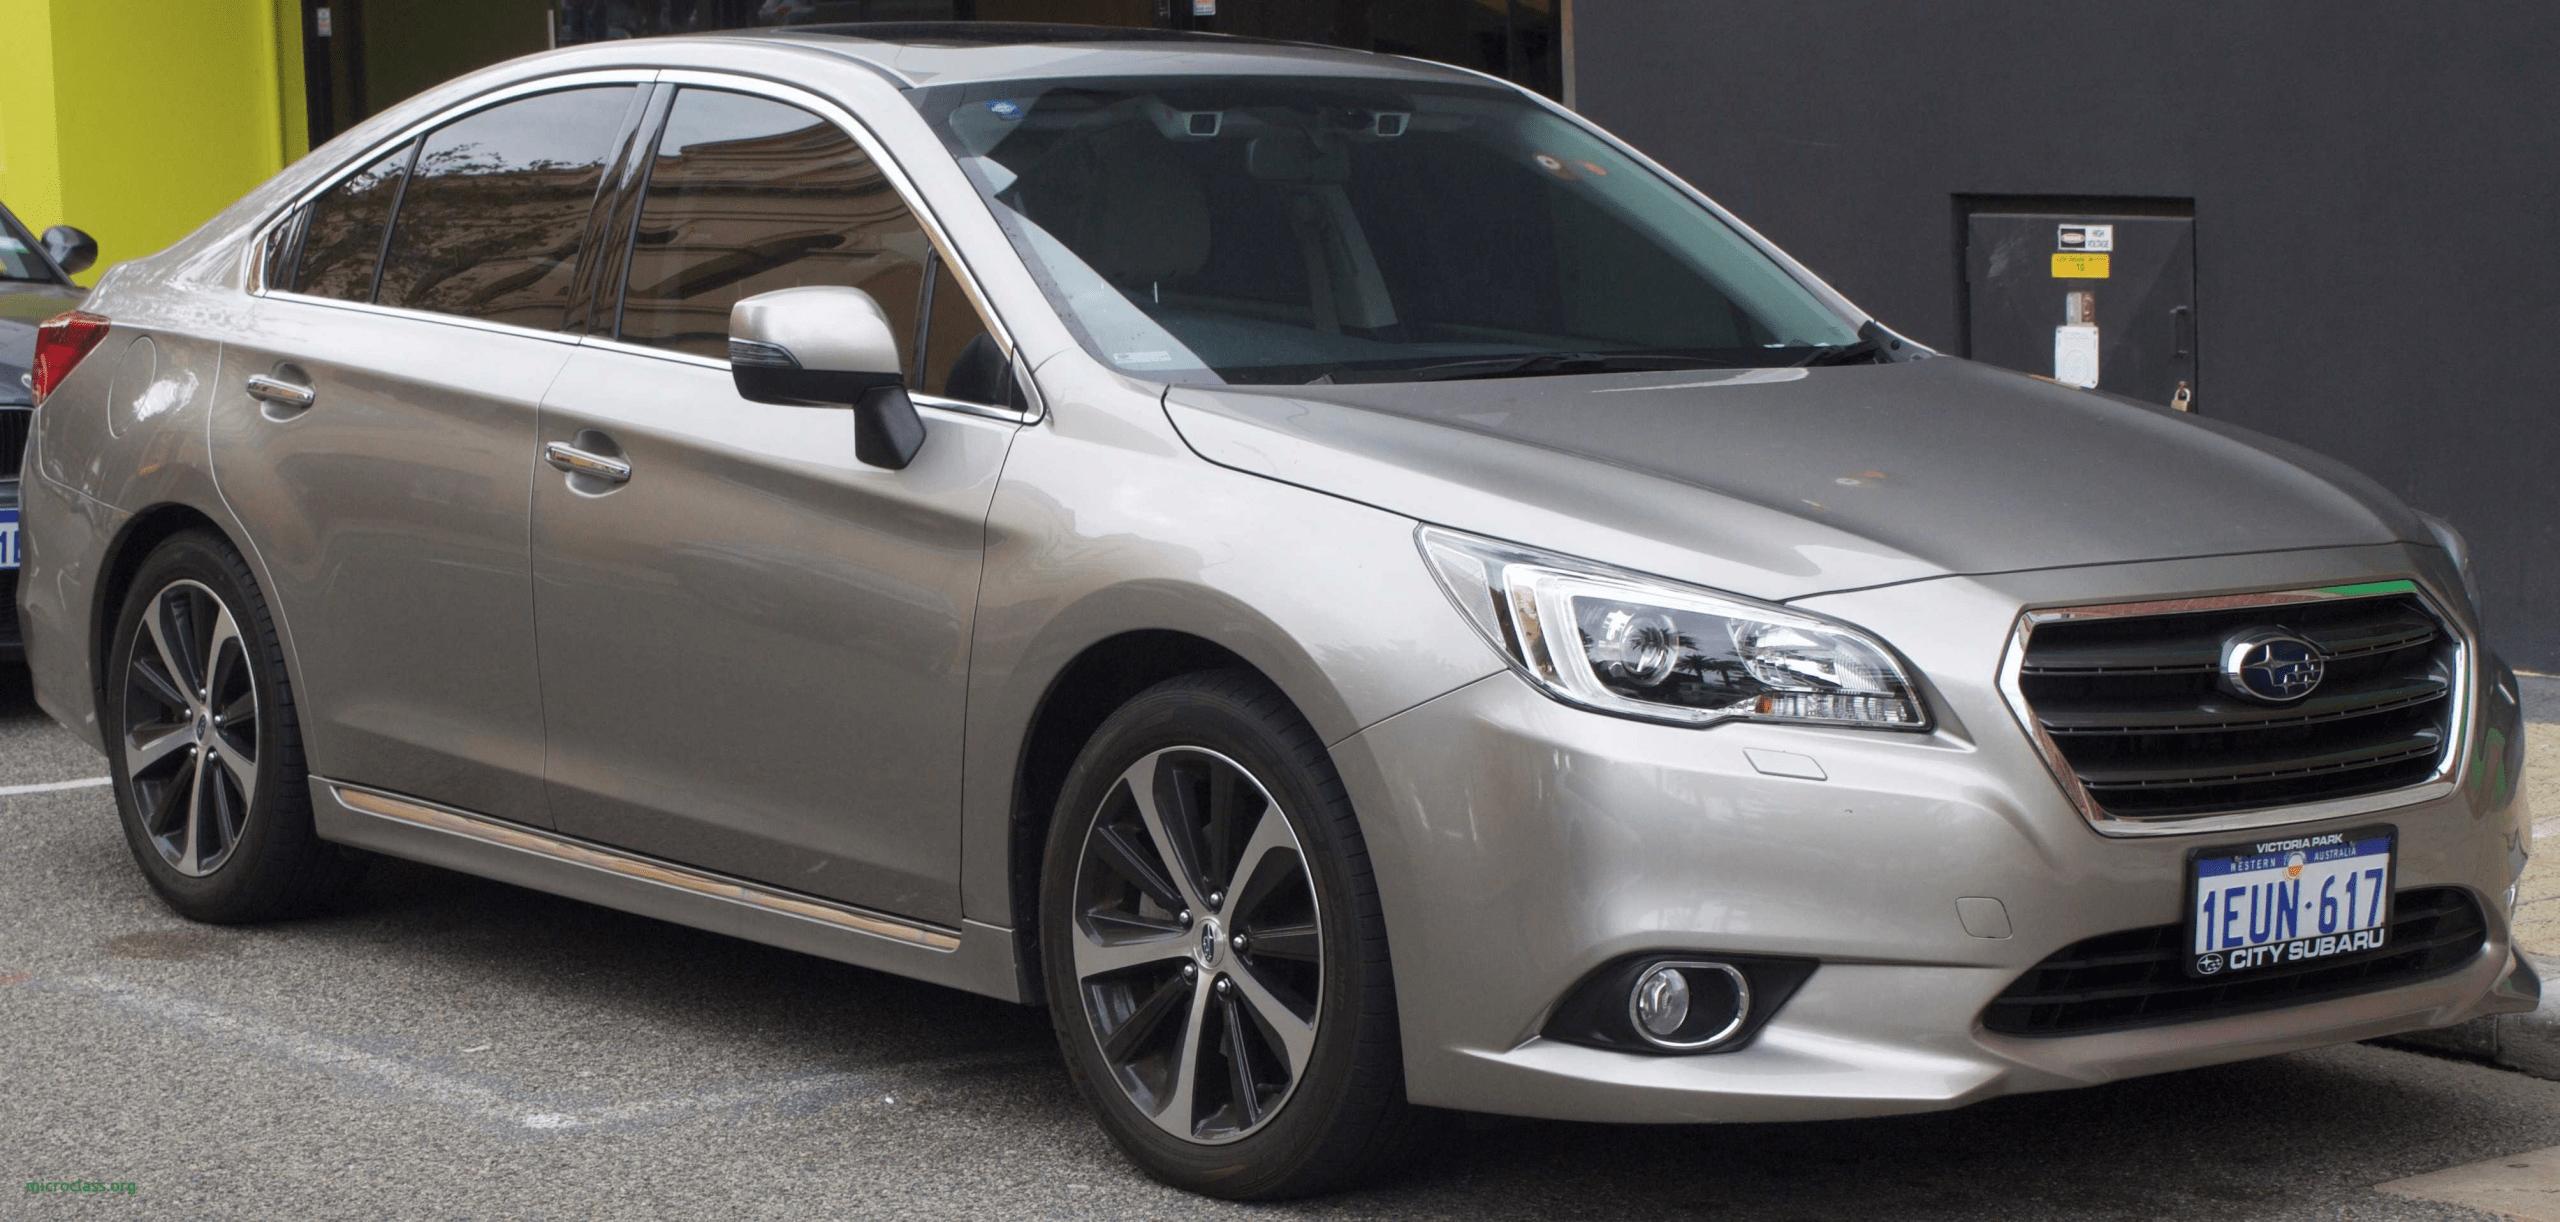 2020 Volkswagen Sharan Picture in 2020 Subaru legacy